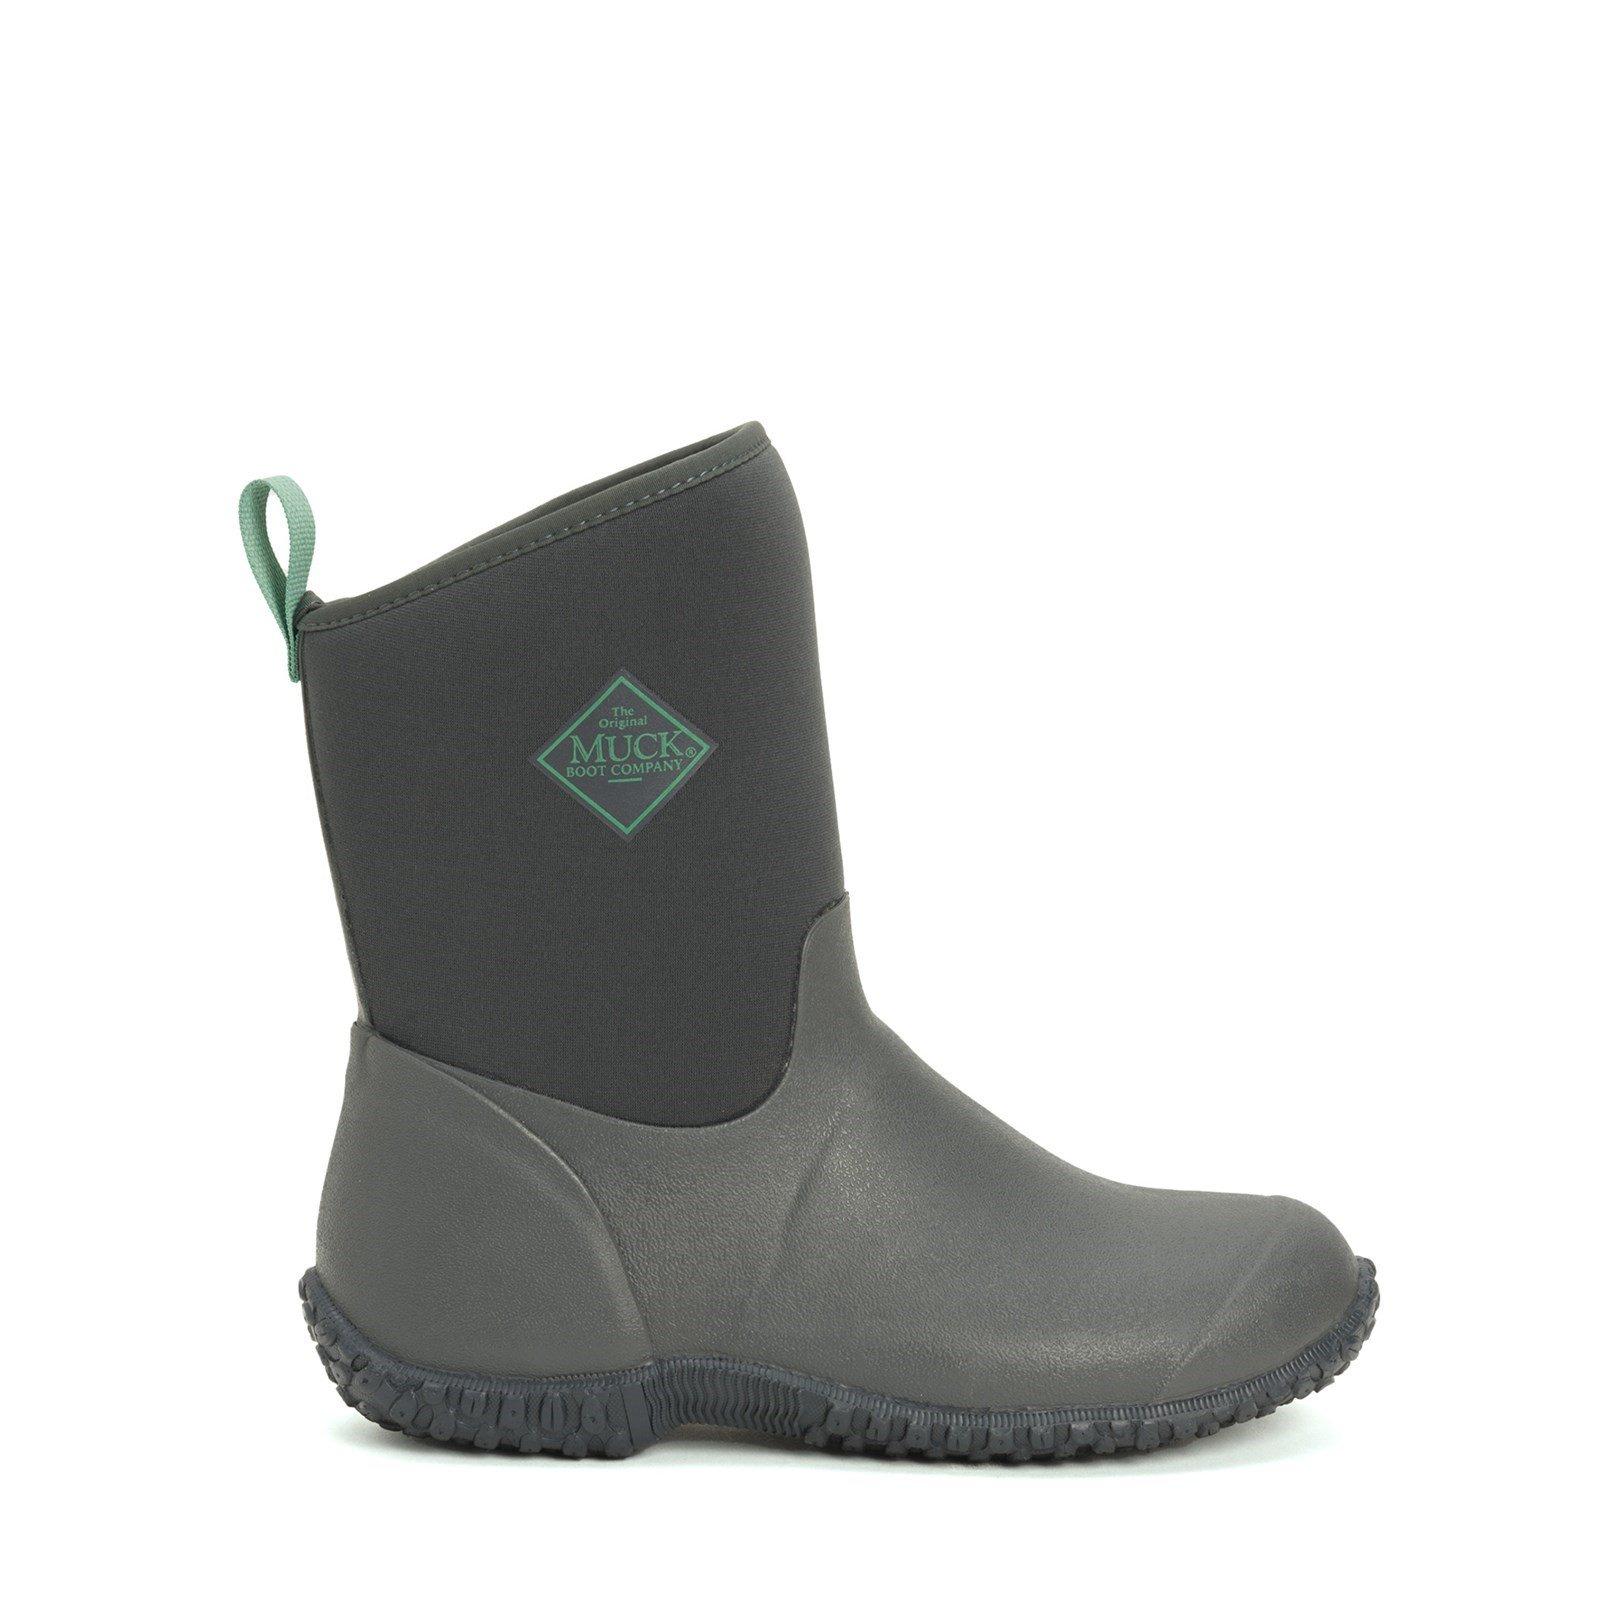 Muck Boots Women's Muckster II Slip On Short Boot Multicolor 28899 - Grey/Print 3